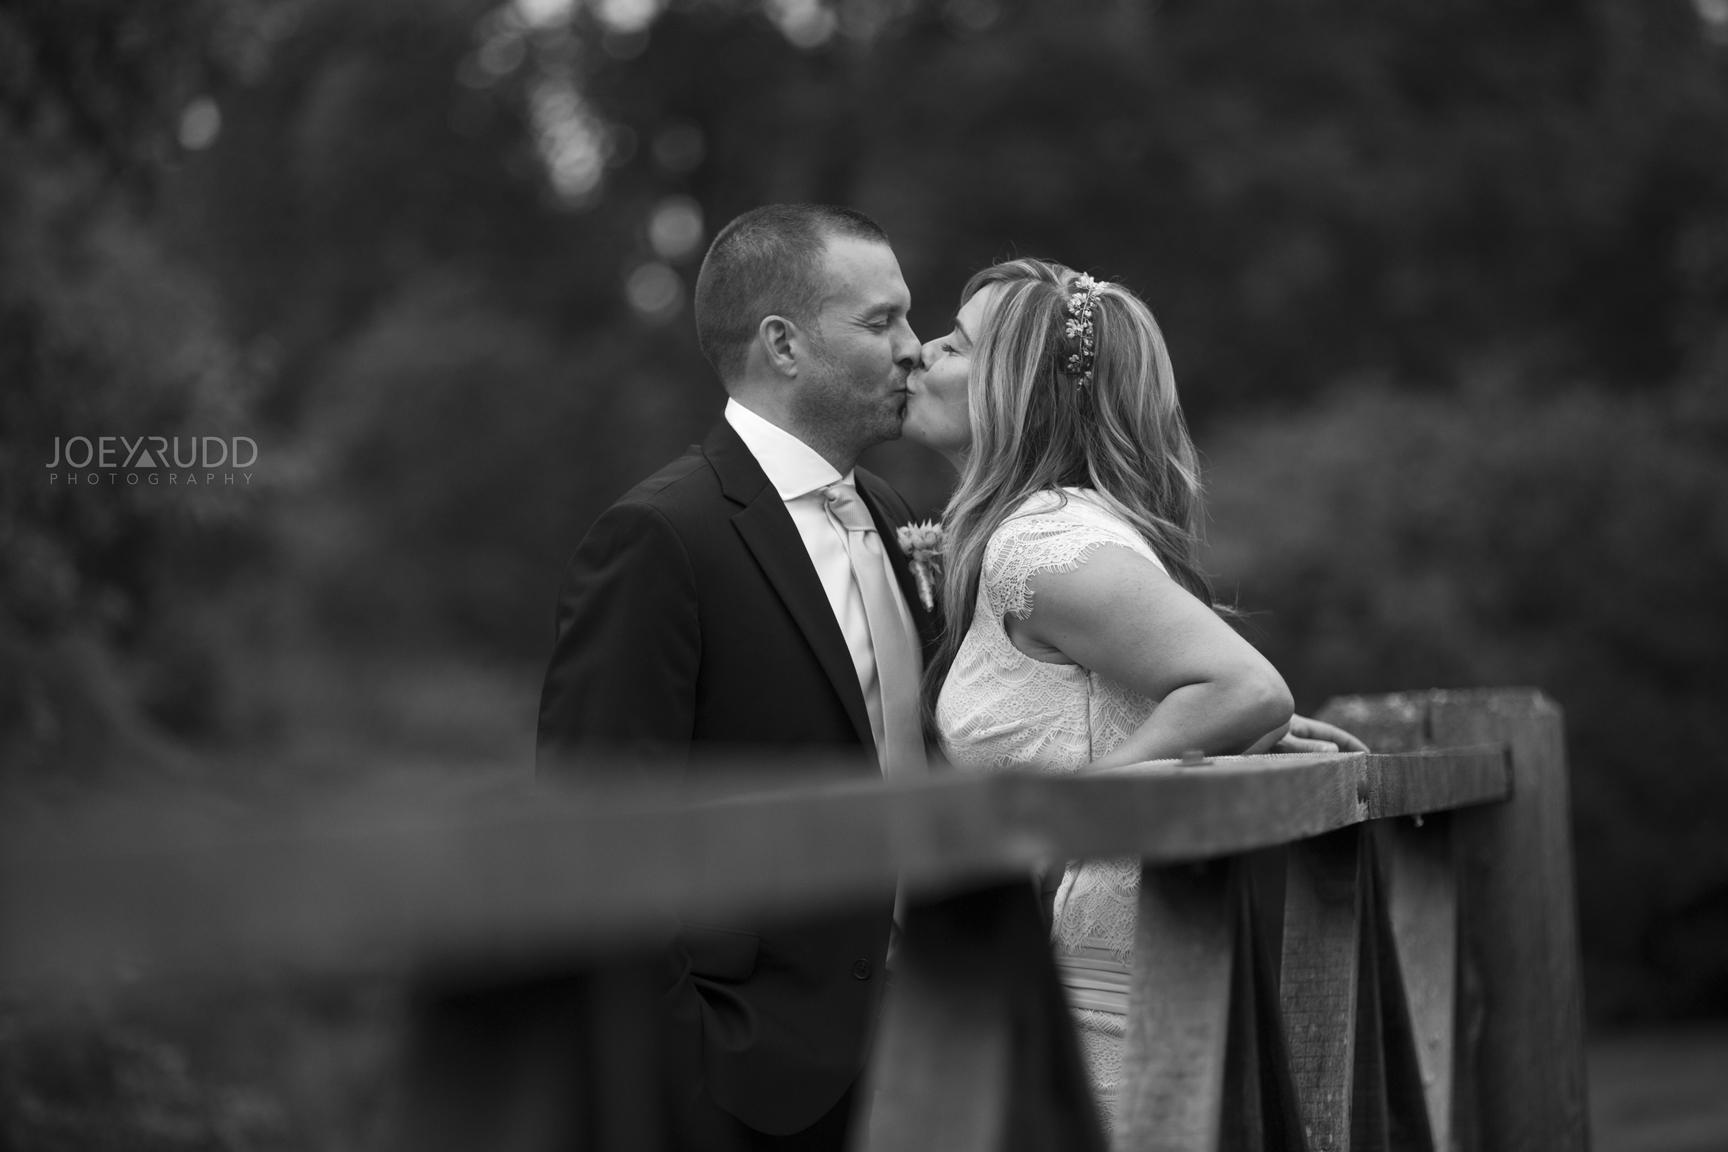 Elopement Wedding by Ottawa Wedding Photographer Joey Rudd Photography Arboretum Black and White